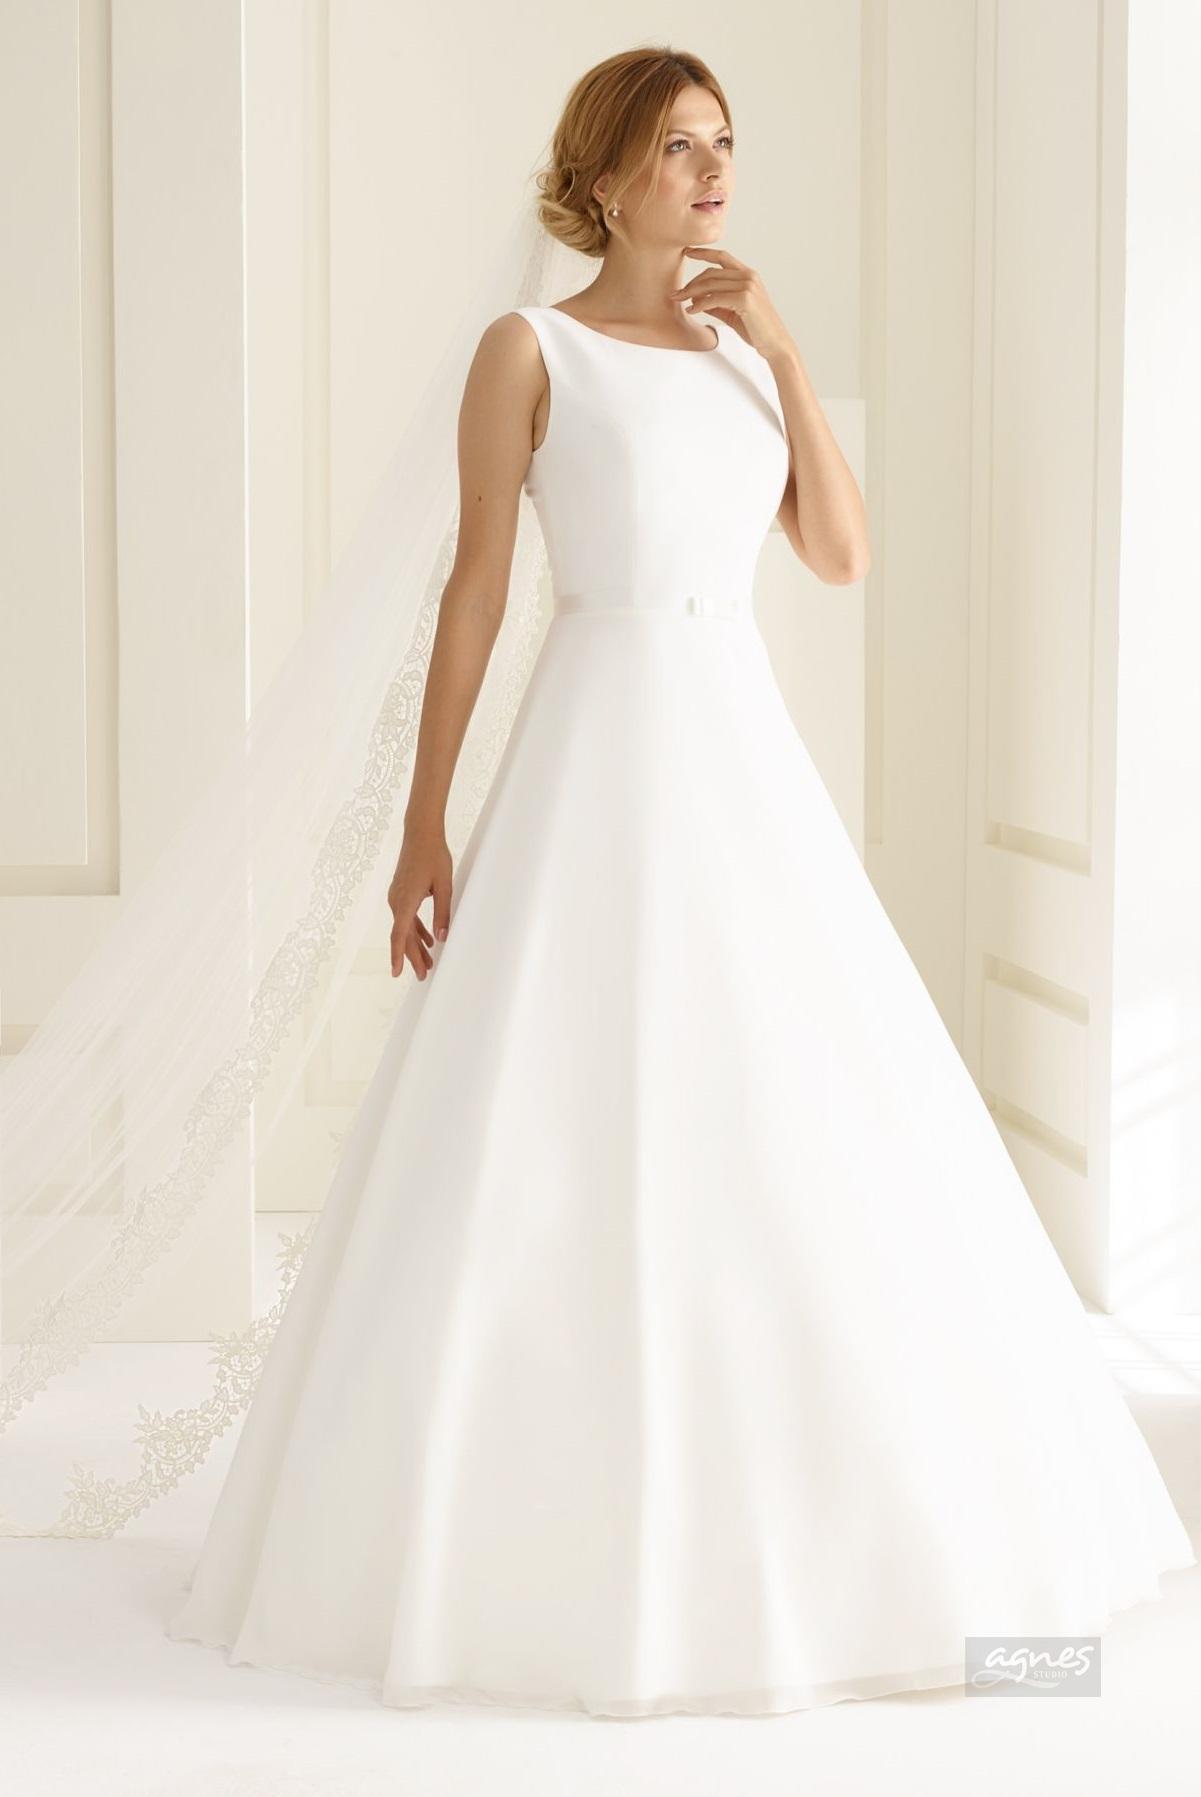 IMPERIA (1)-Bianco-Evento-bridal-dress-studioagnes